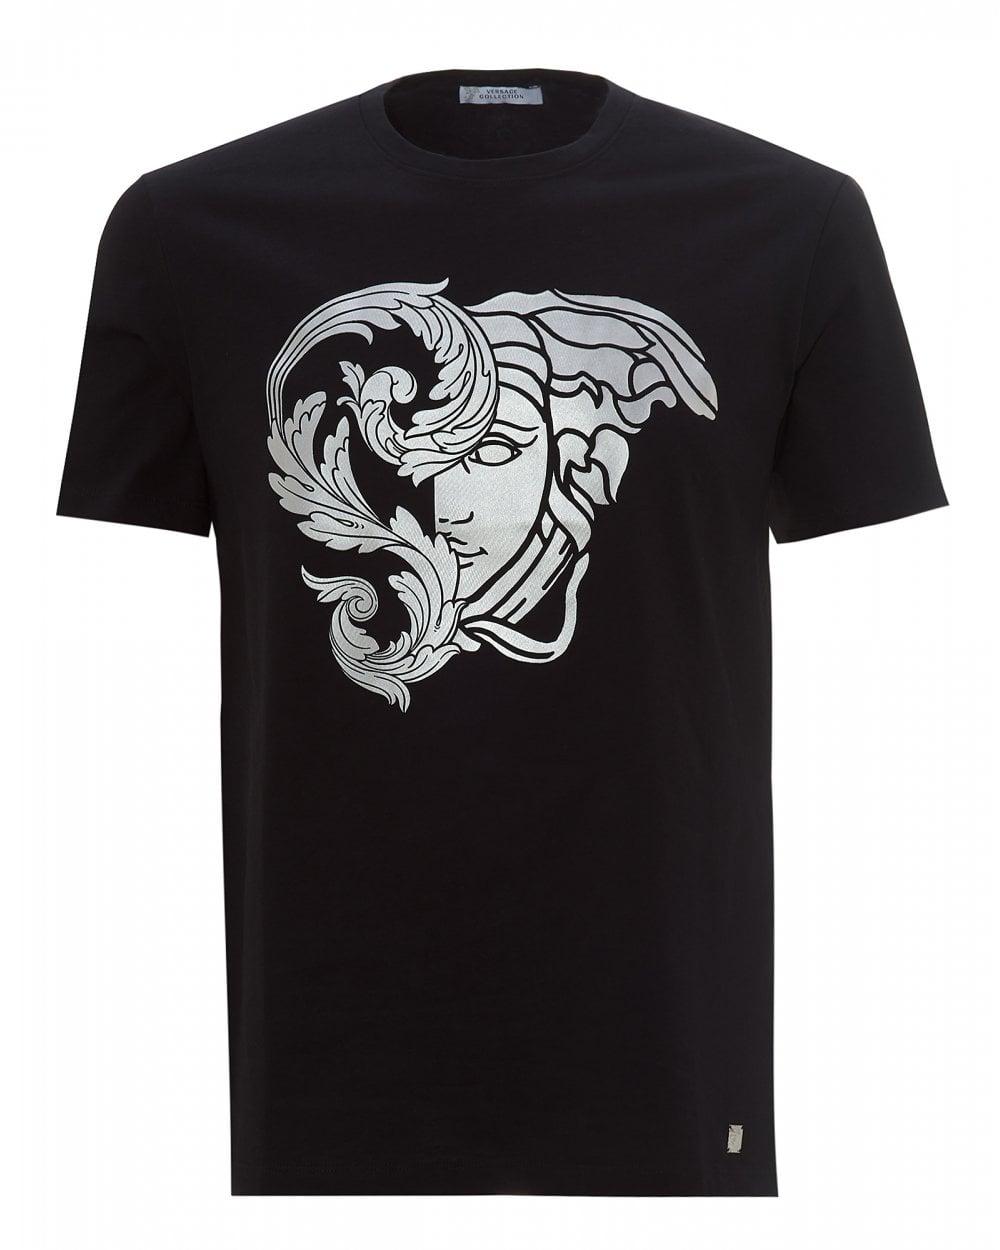 reputable site ab2a9 b862d Mens Foil Medusa Logo T-Shirt, Black Tee